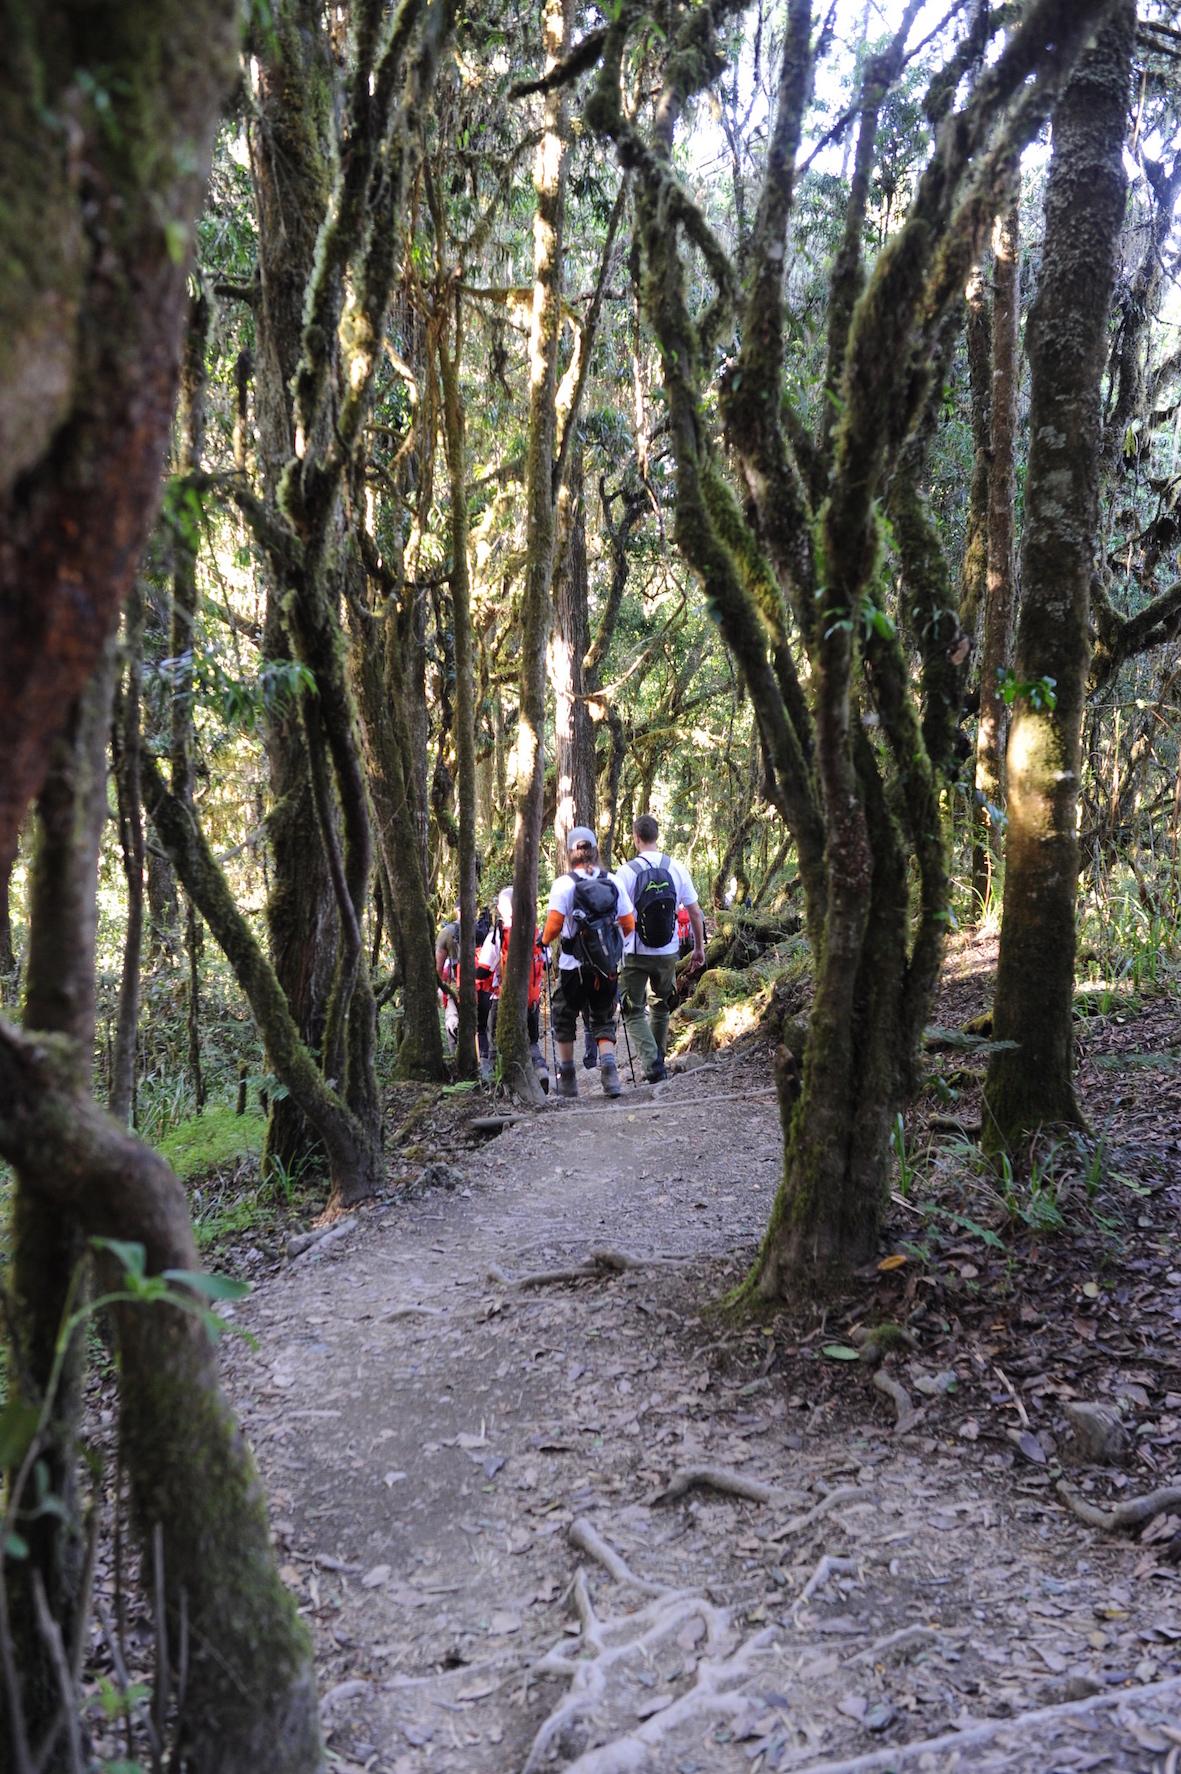 kilimanjaro-vandring-nedat